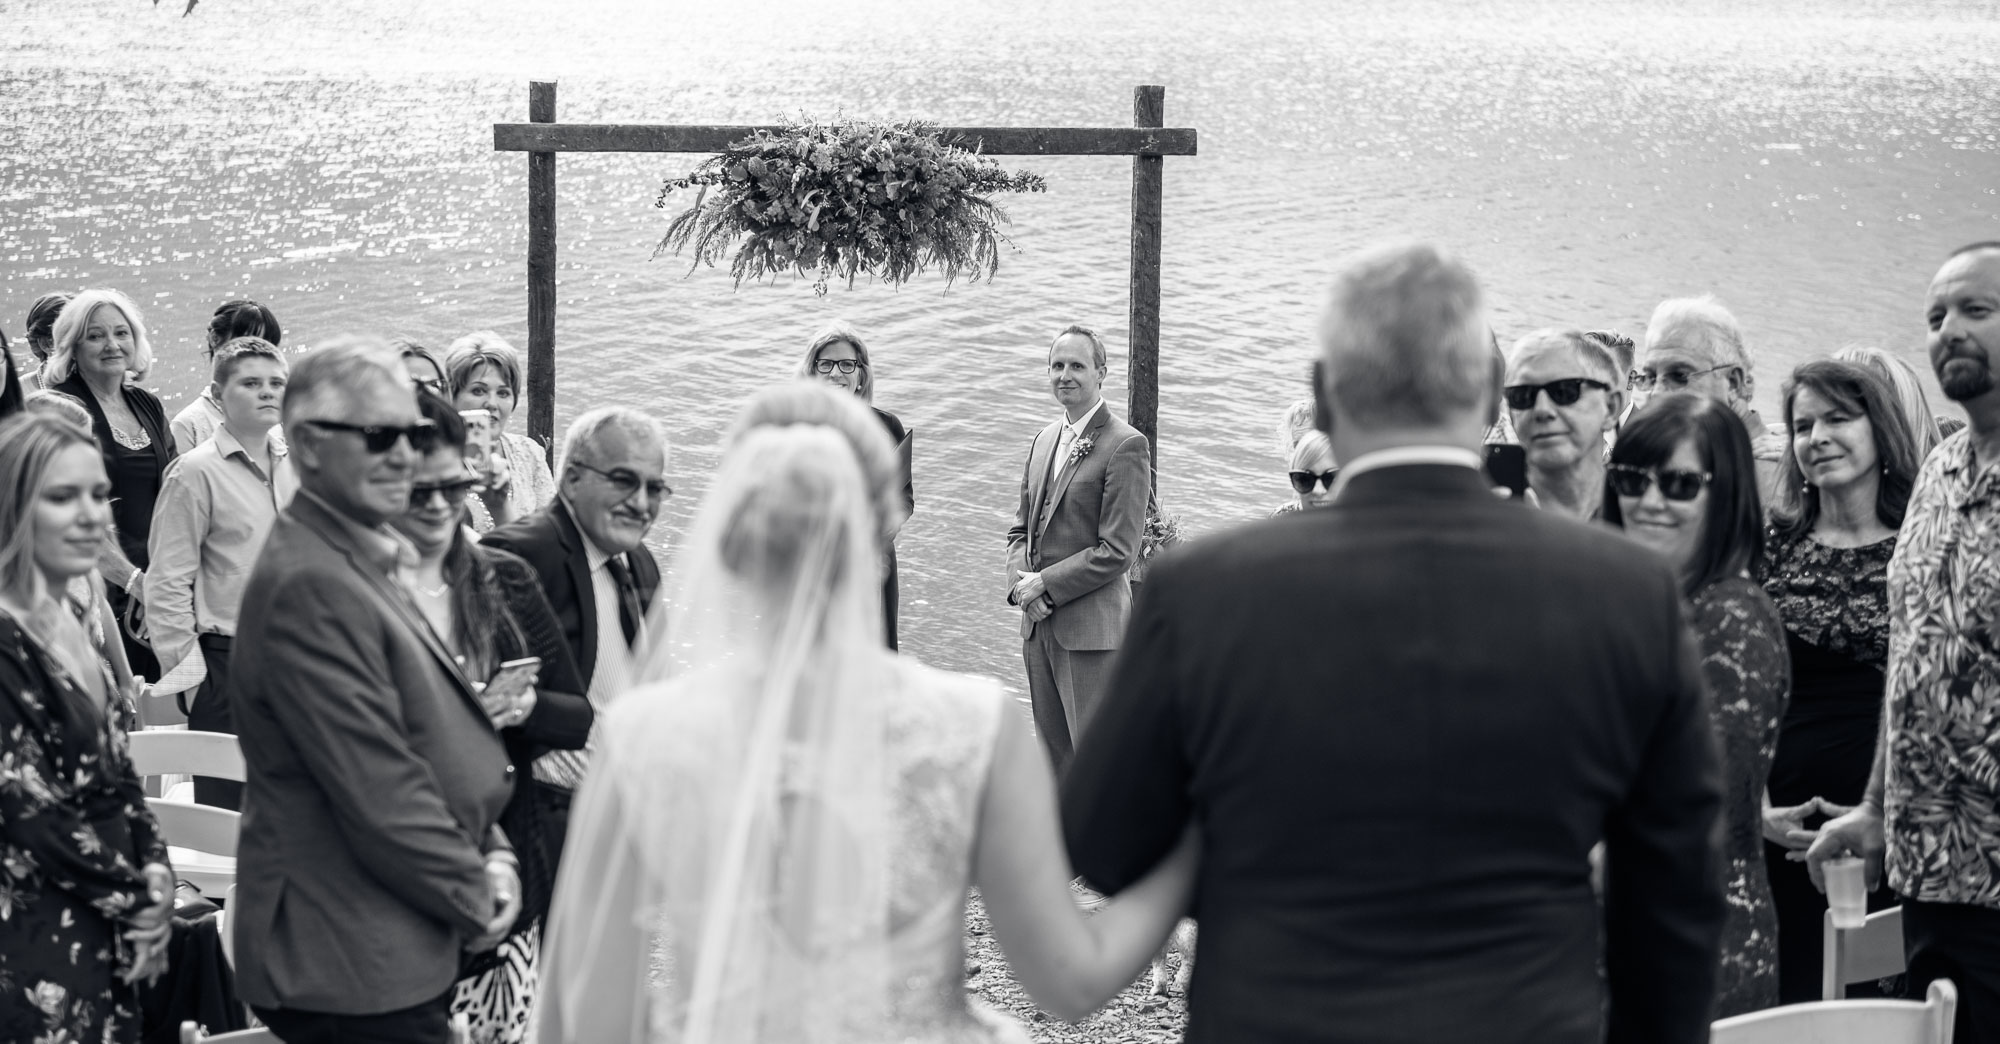 Stephanie & Taylor's Mammoth Lakes Wedding – Convict Lake Wedding featured slider image